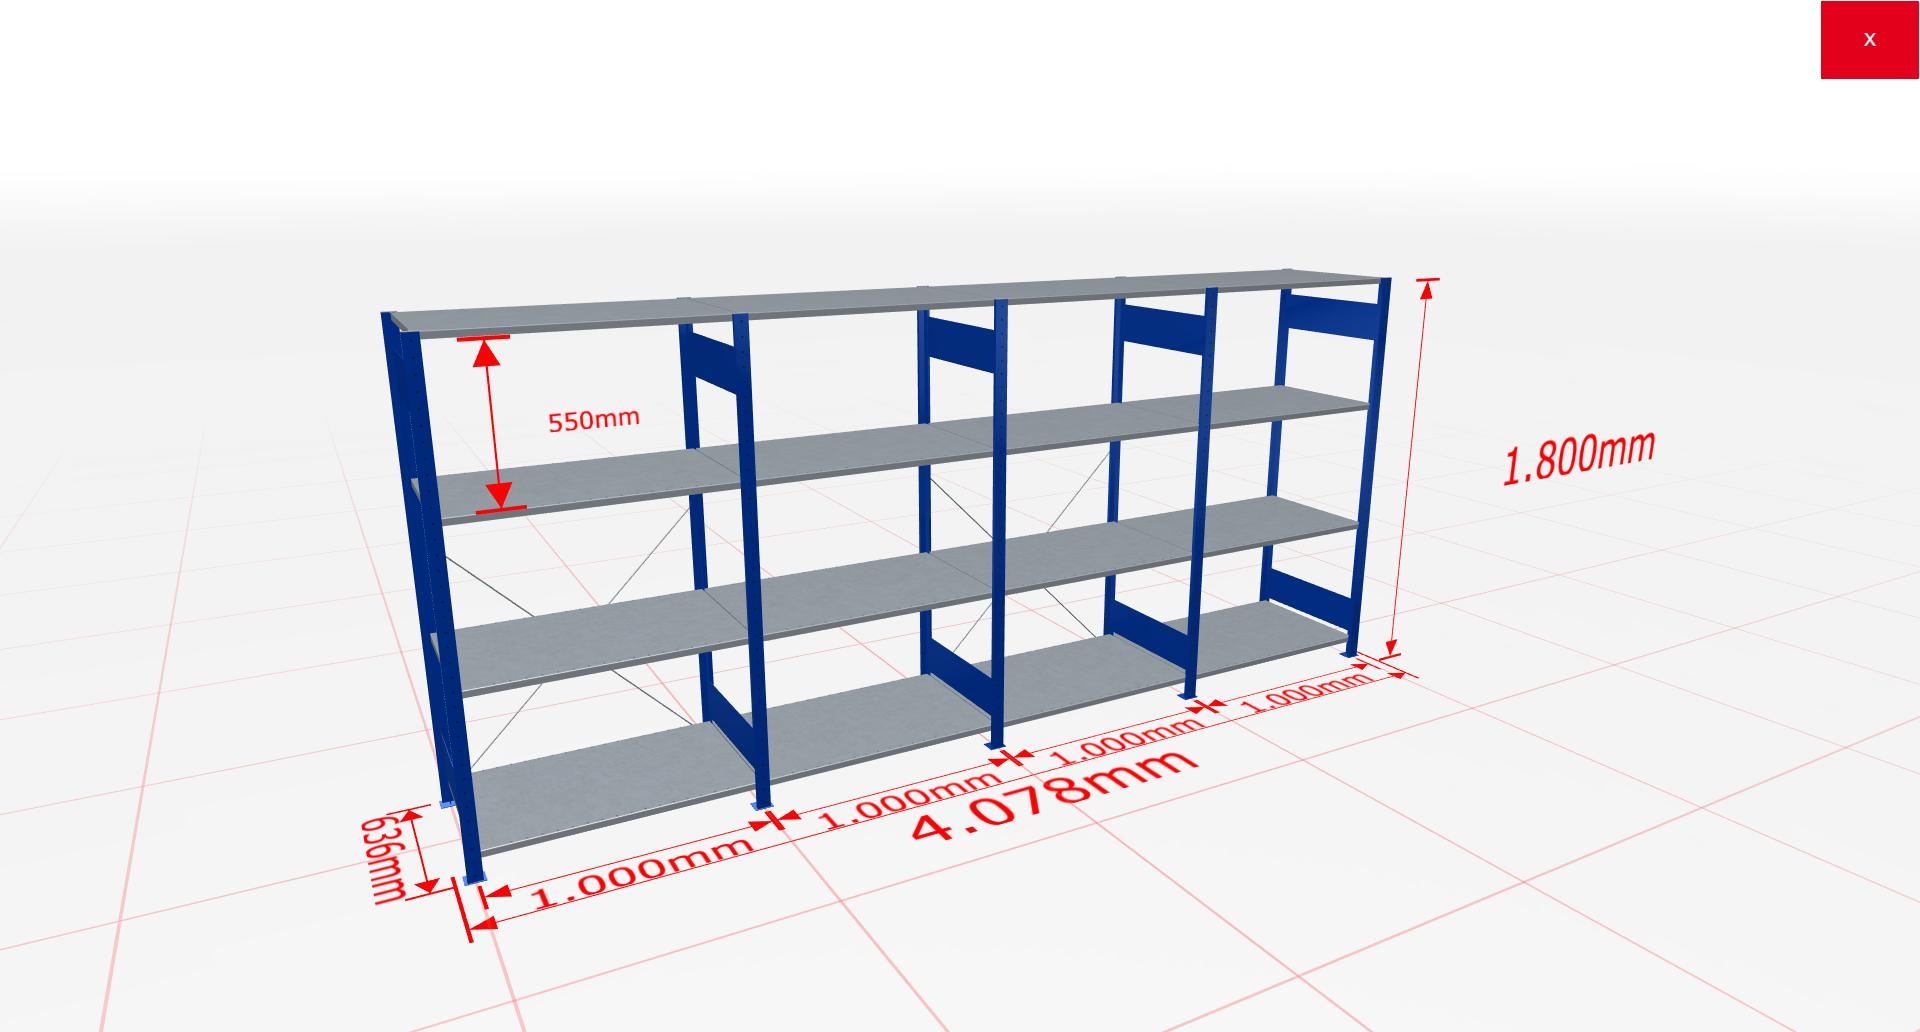 Fachbodenregal Komplettregal 1800x4078x600 mm (HxBxT) SCHULTE Lagertechnik blau 4 Ebenen  150 kg je Boden